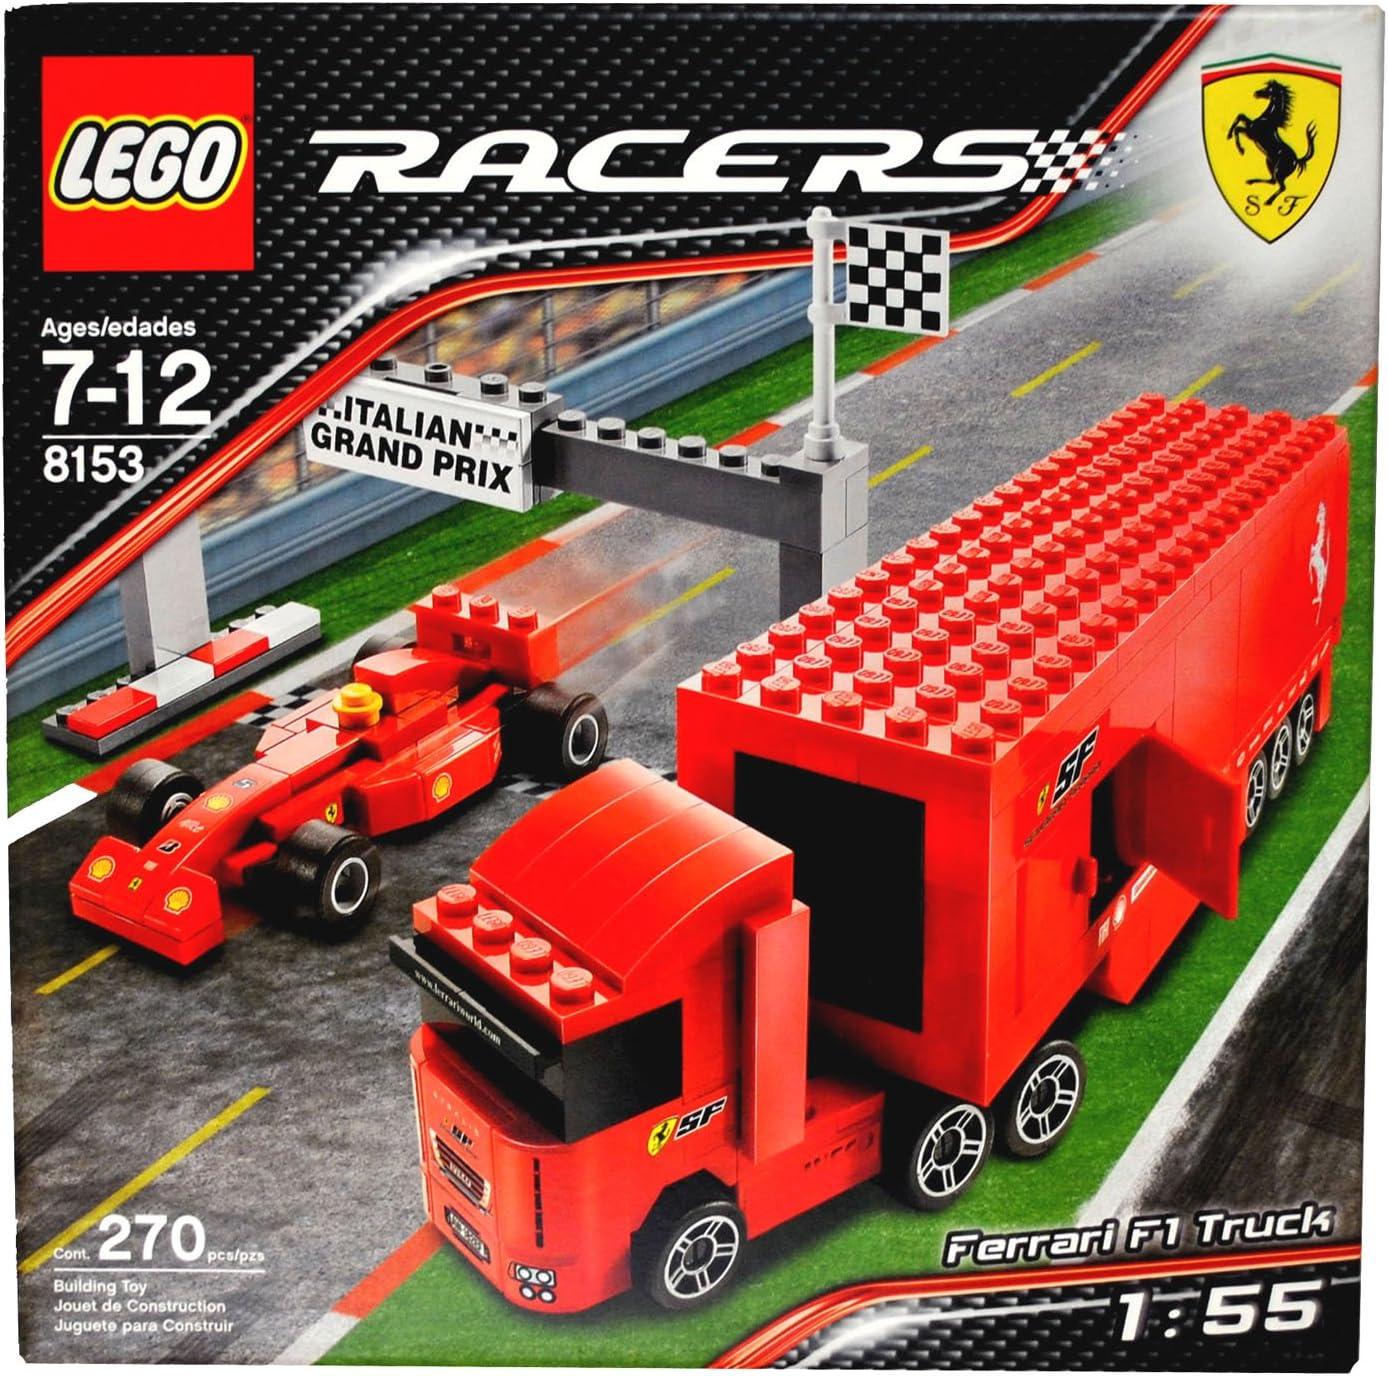 Amazon Com Lego Racers Ferrari F1 Truck Toys Games